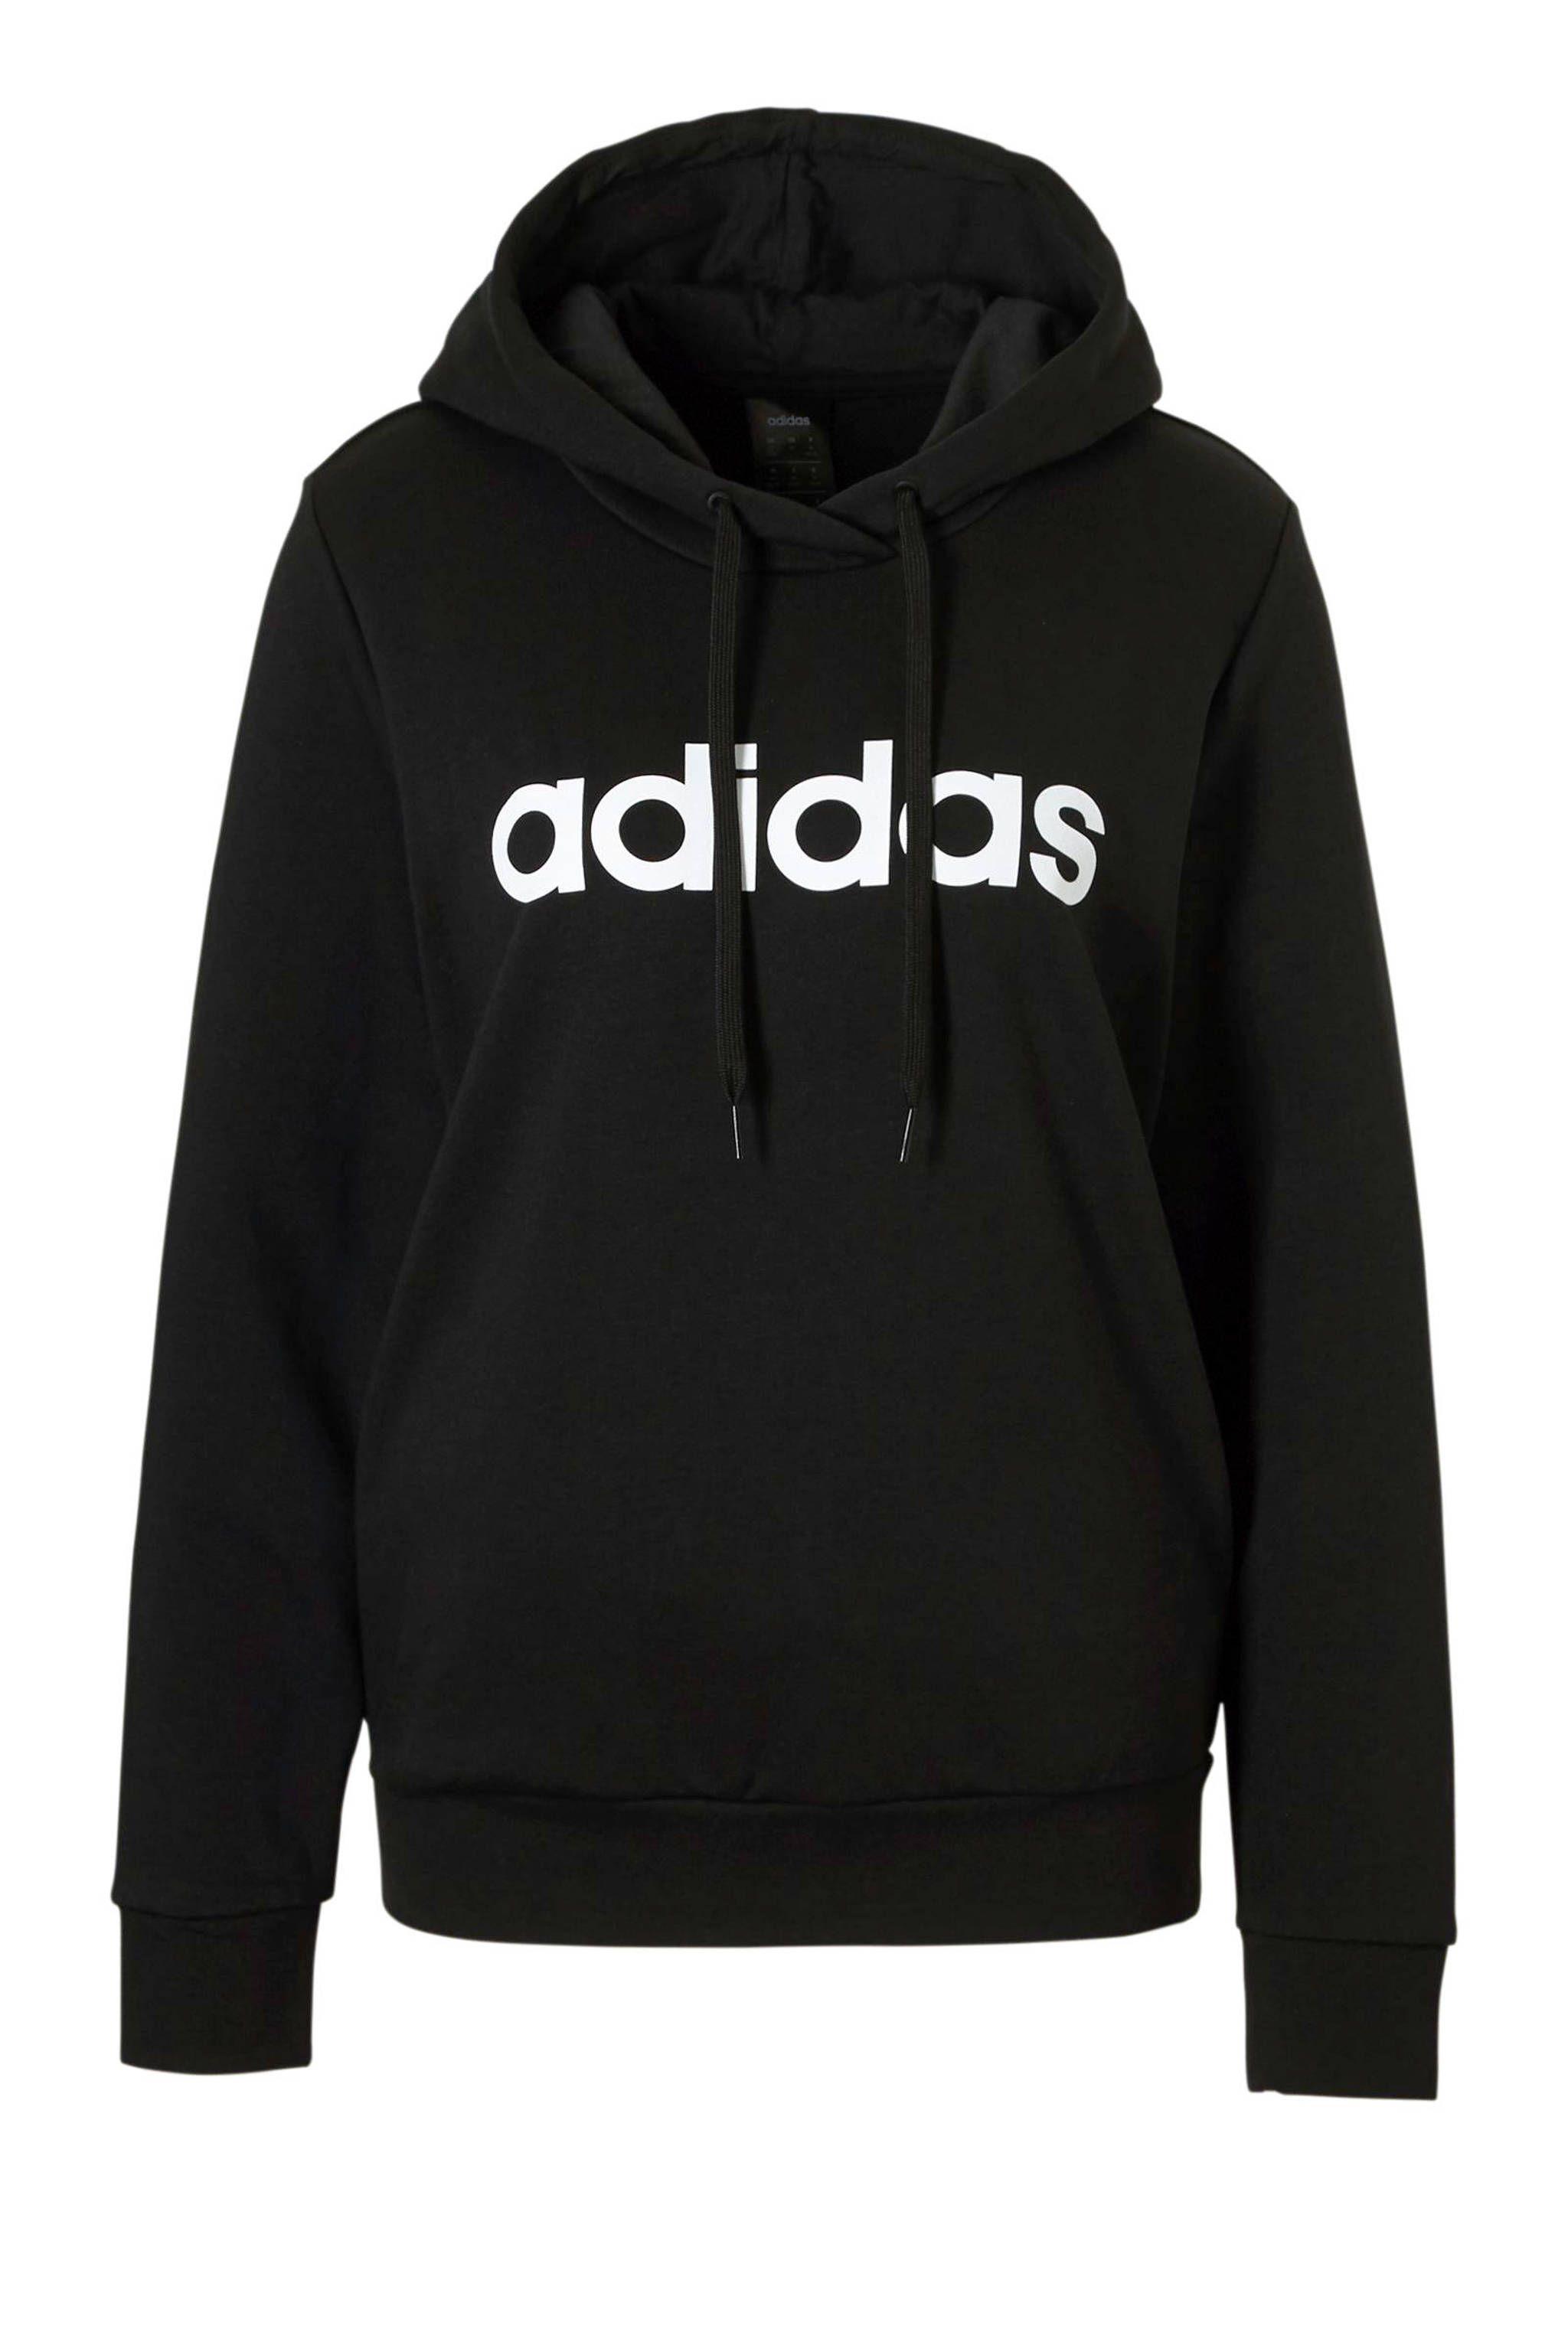 sportsweater zwart | Sweater, Hoodie, Trui